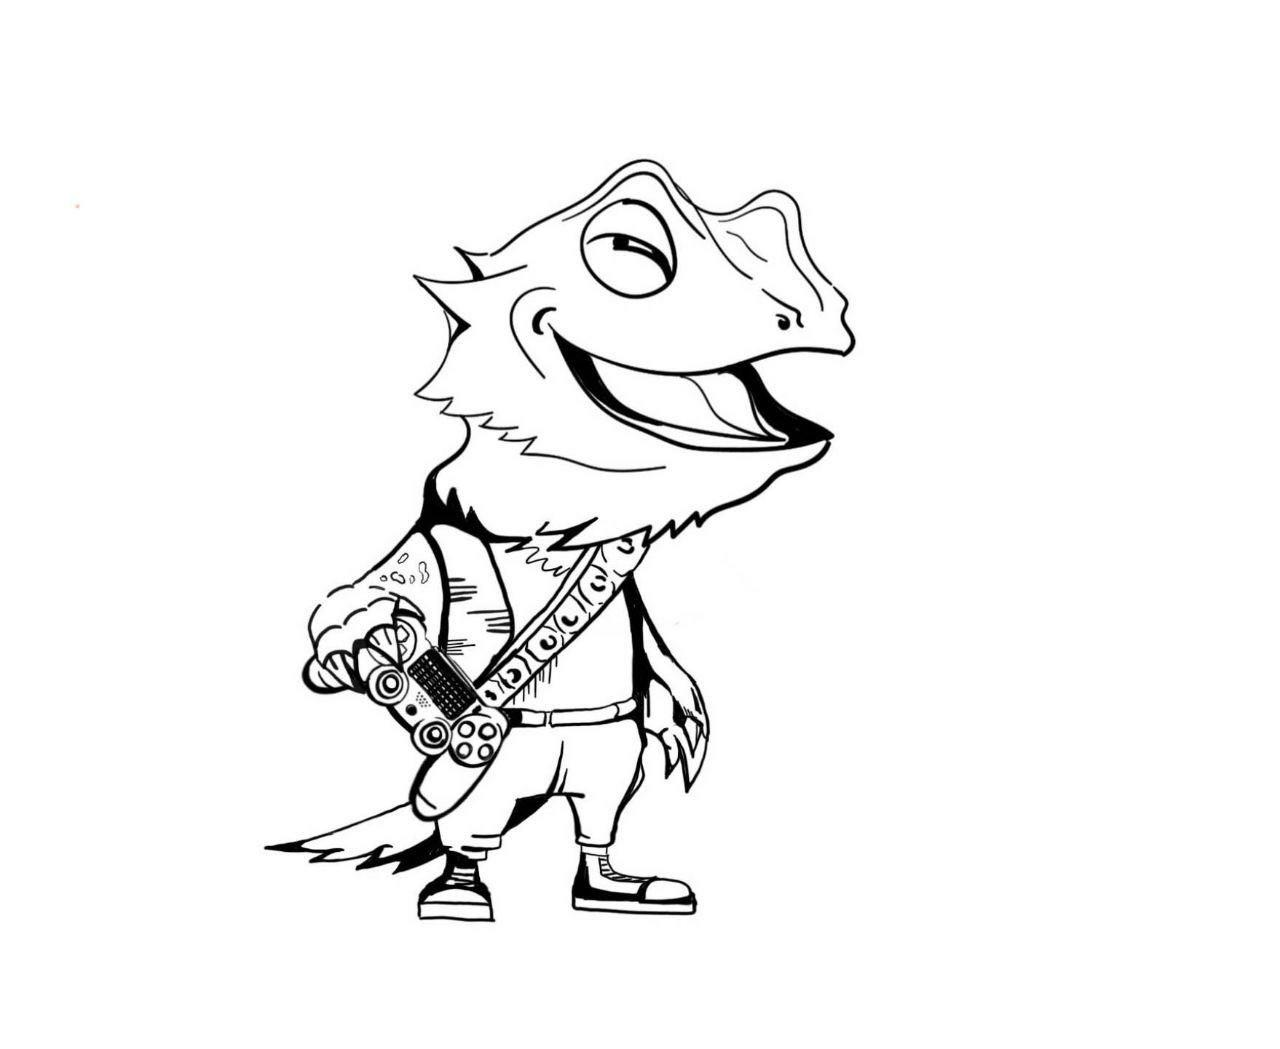 Нарисовать персонажа фриланс freelance research jobs